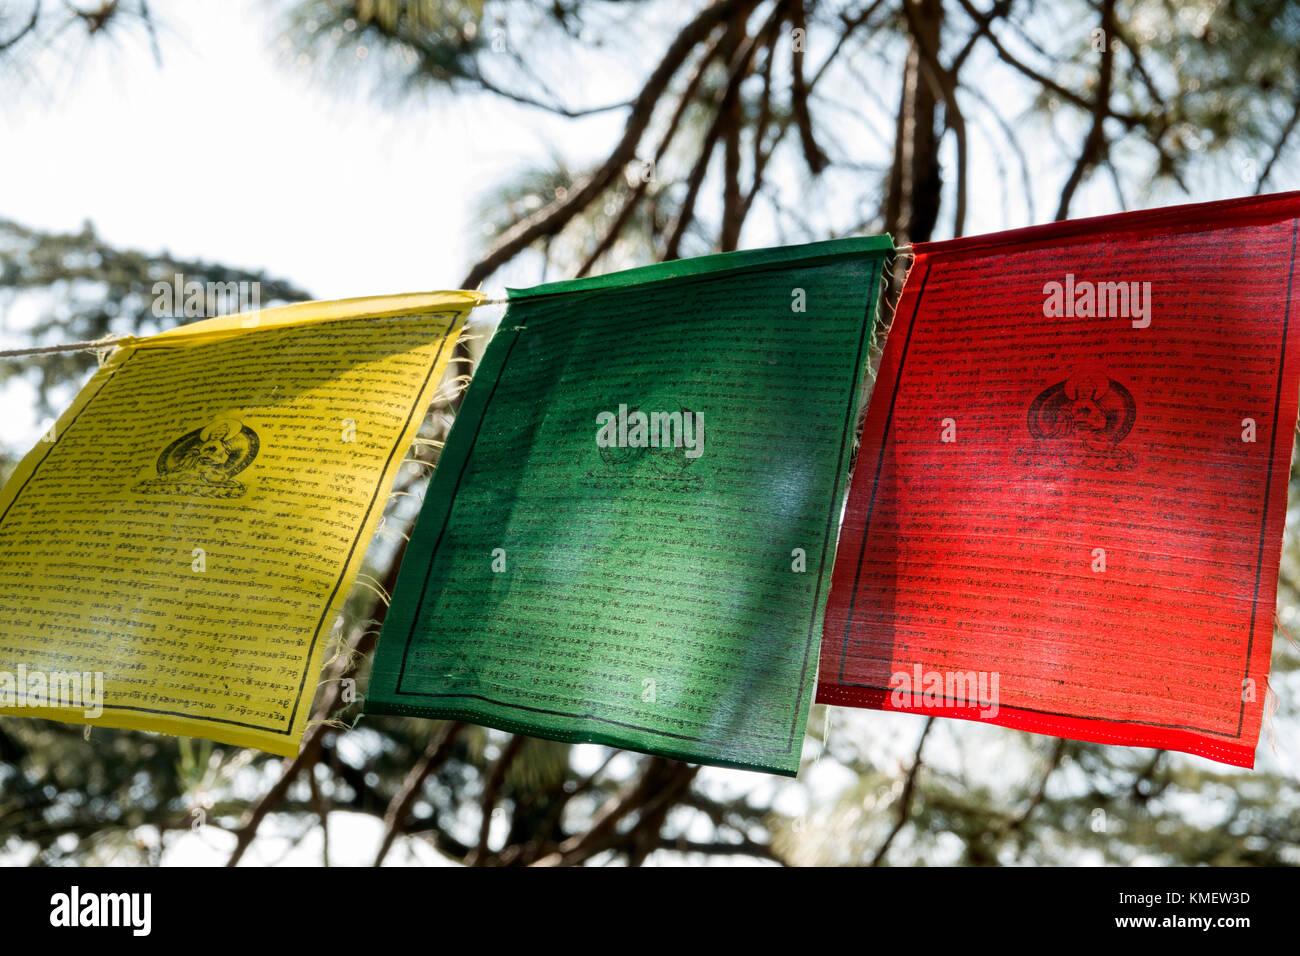 Tibetan prayer flags hanging in trees at Mcleod Ganj, Himachal Pradesh - Stock Image